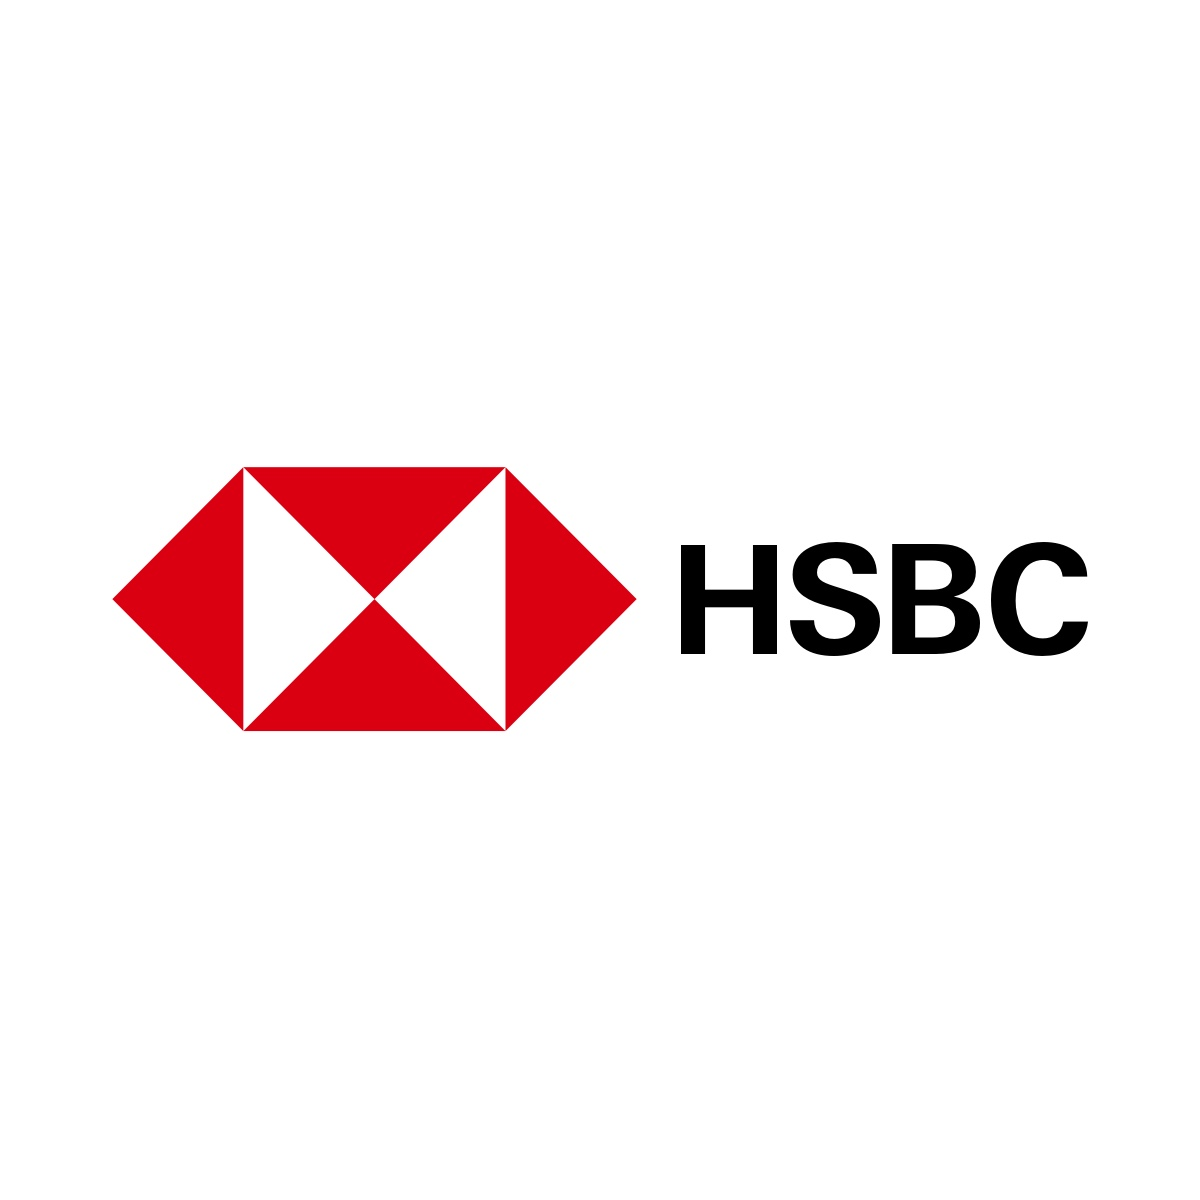 Ways to bank - HSBC BM